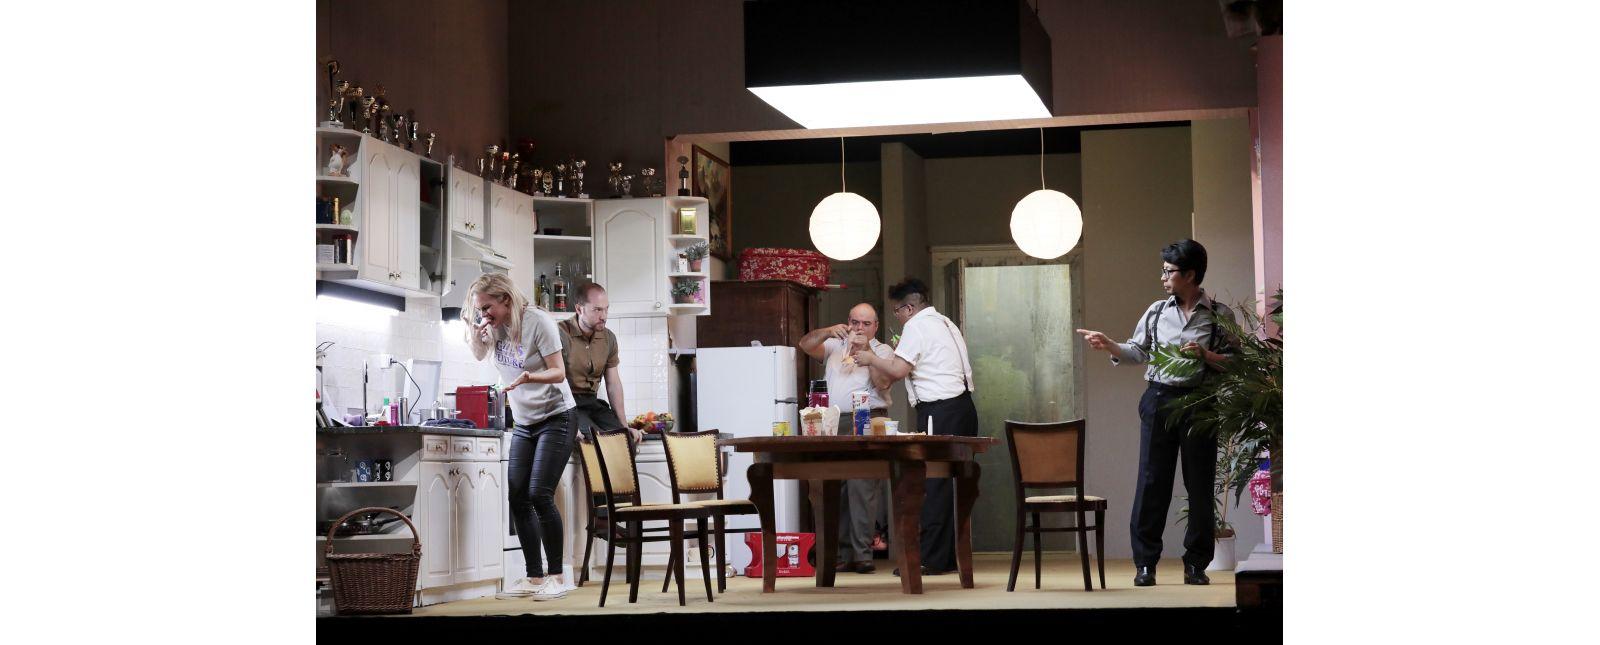 DIE 7 TODSÜNDEN & MOTHERLAND // Nora Buzalka / John Carpenter / Roberto Gionfriddo / Junbum Lee / Jin Seok Lee // 2020 // Paul Leclaire